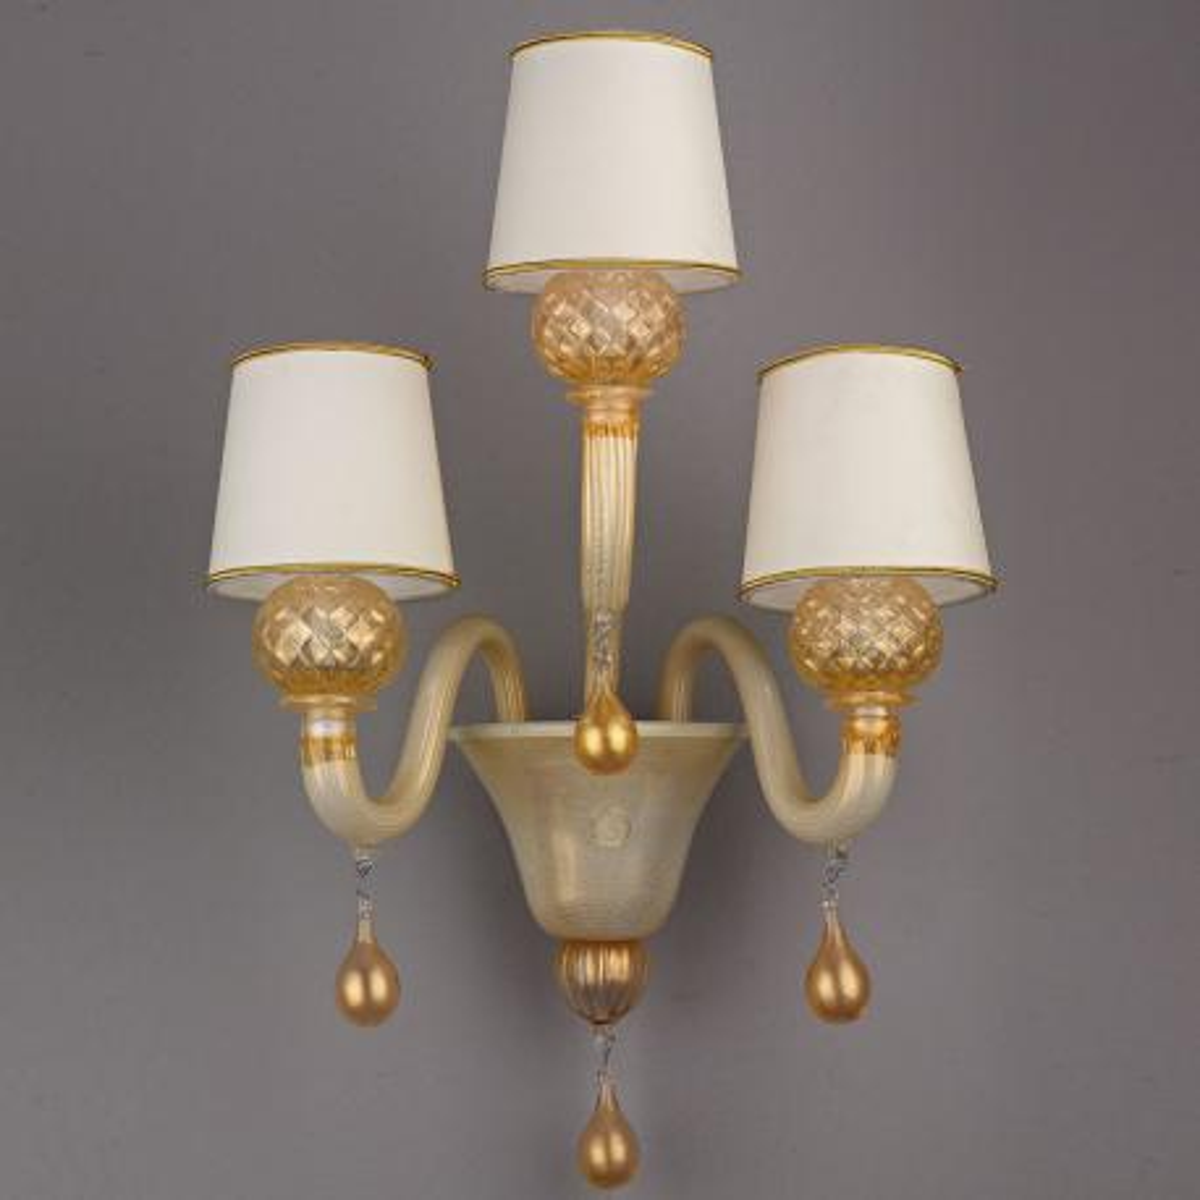 """Pegaso"" lustre en cristal de Murano - blanc et or -"